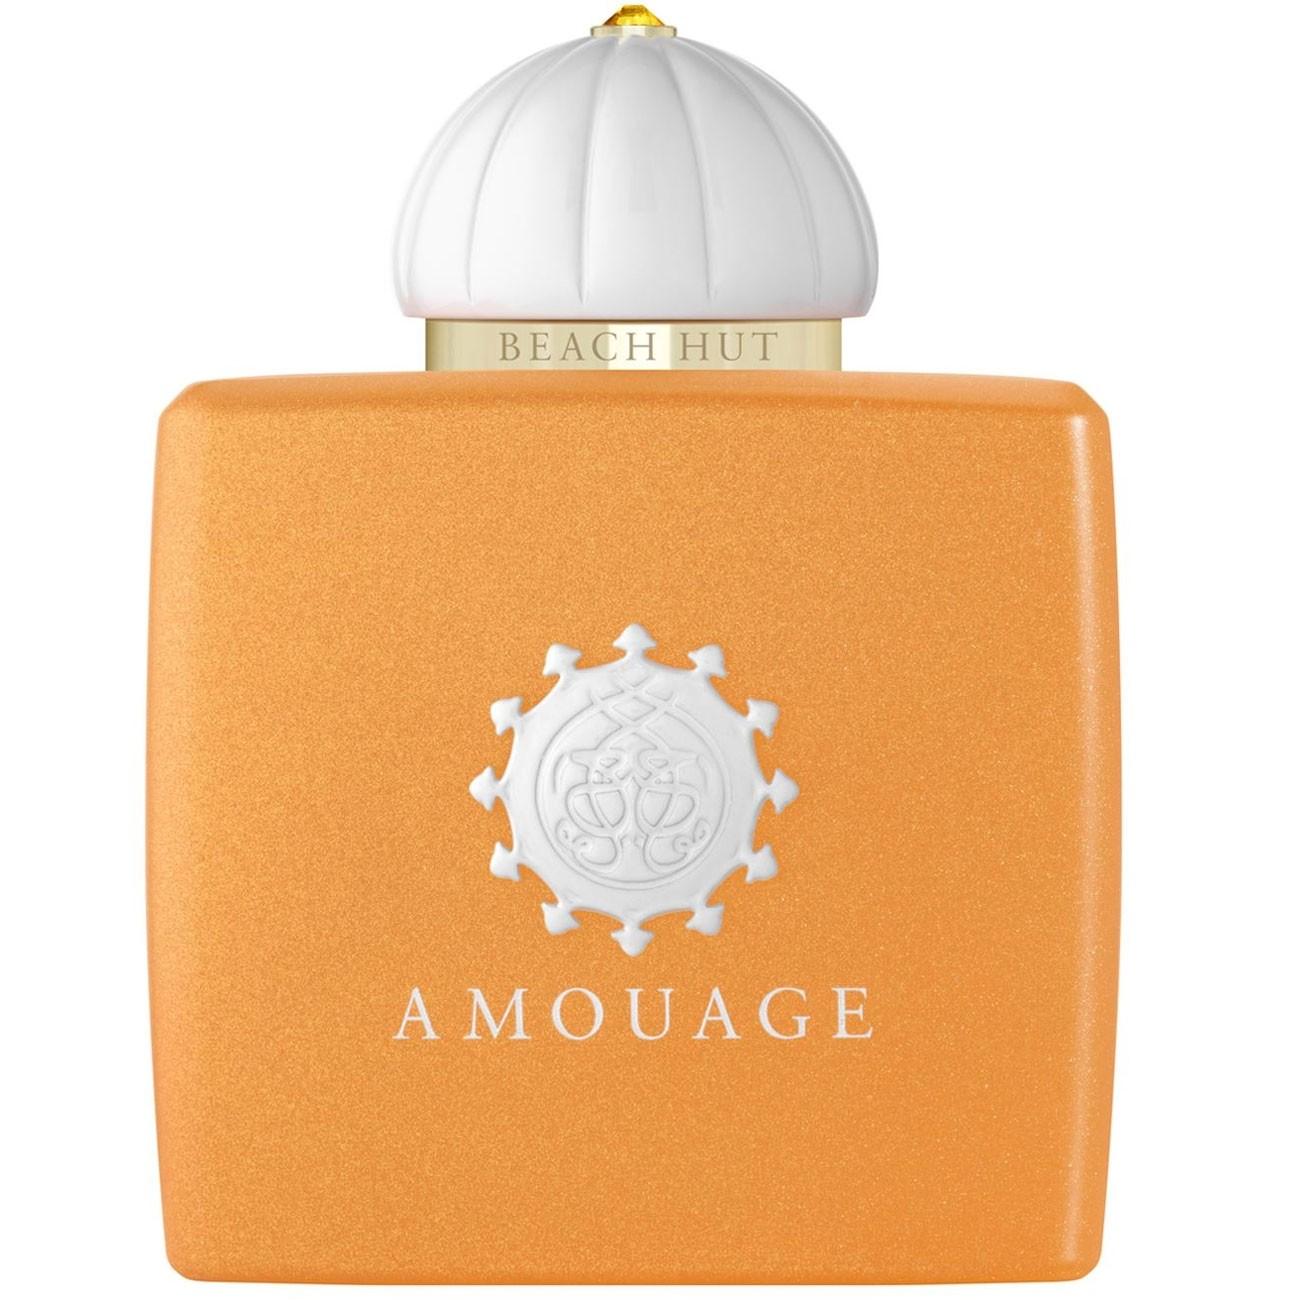 Afbeelding van Amouage Beach Hut Woman 100 ml eau de parfum spray